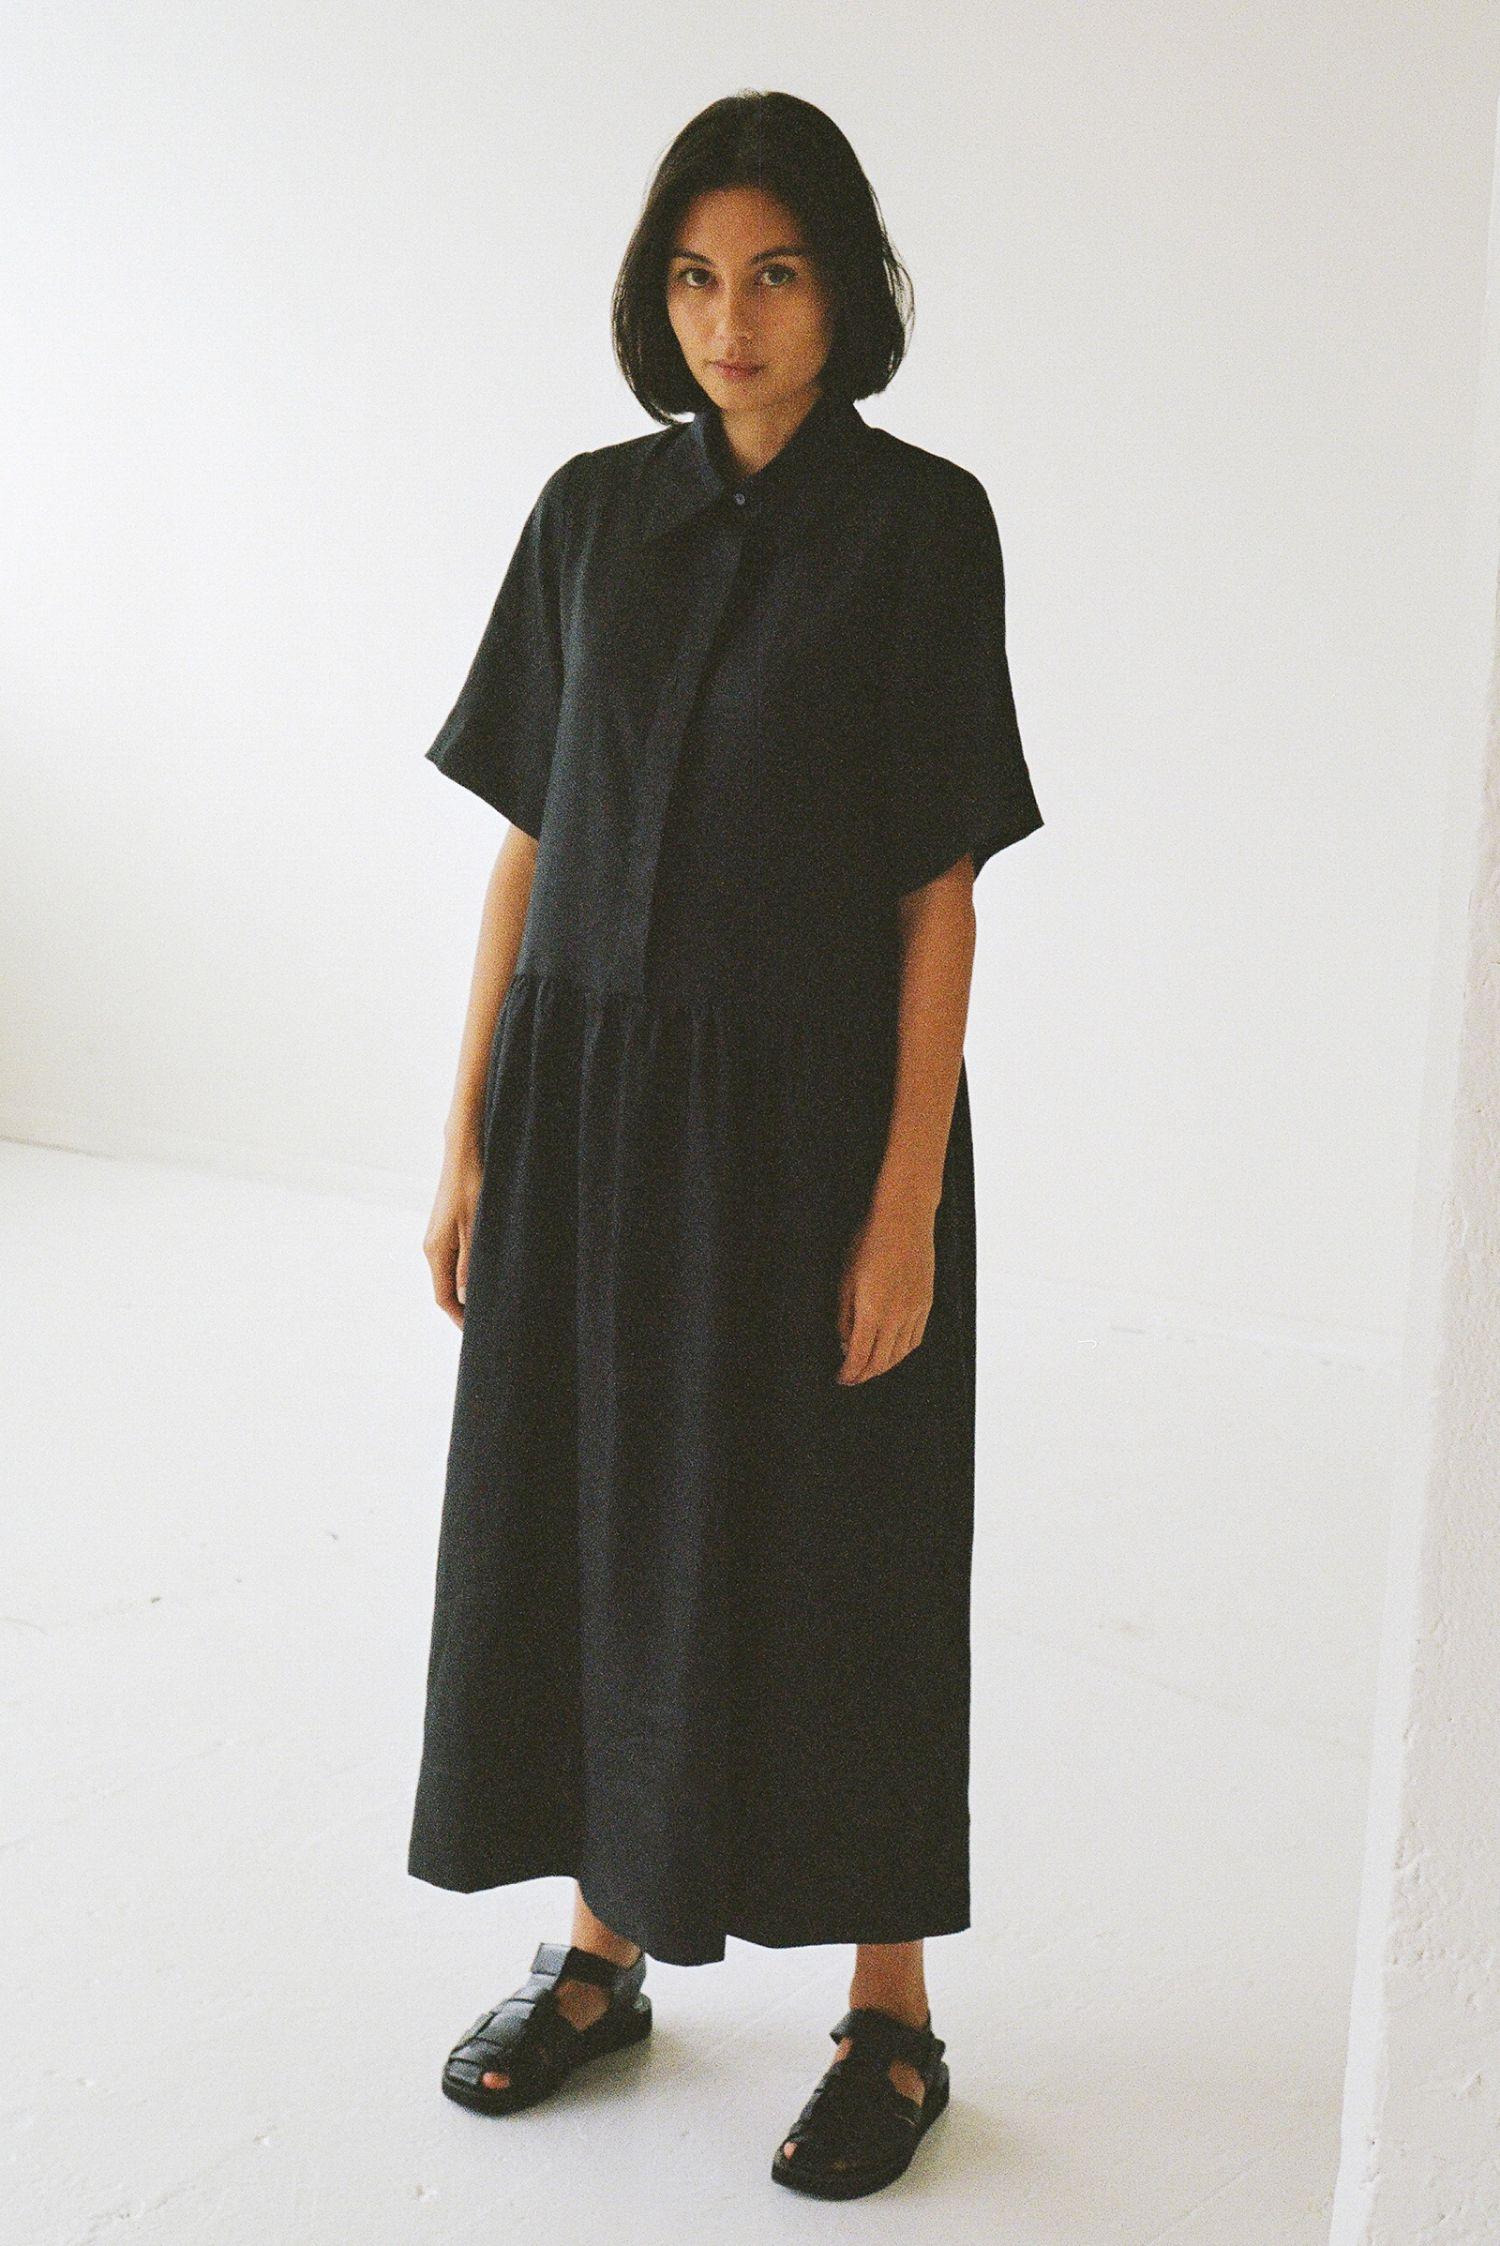 Mes deux midi dress linen - Ellis Label - Made to order womenswear - New Zealand_0020_83110028